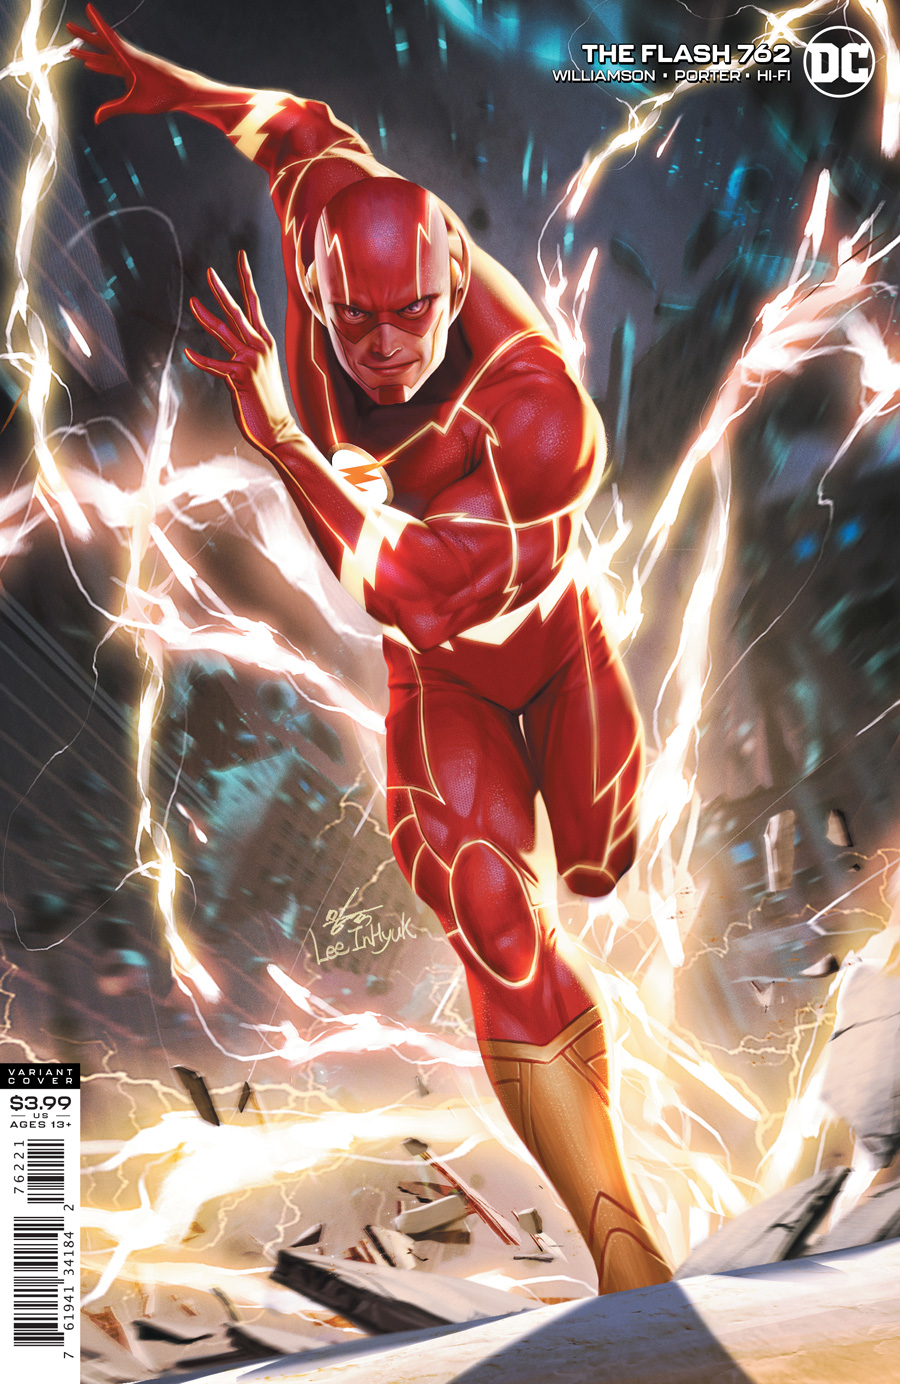 Flash Vol 1 #762 Cover B Inhyuk Lee Variant